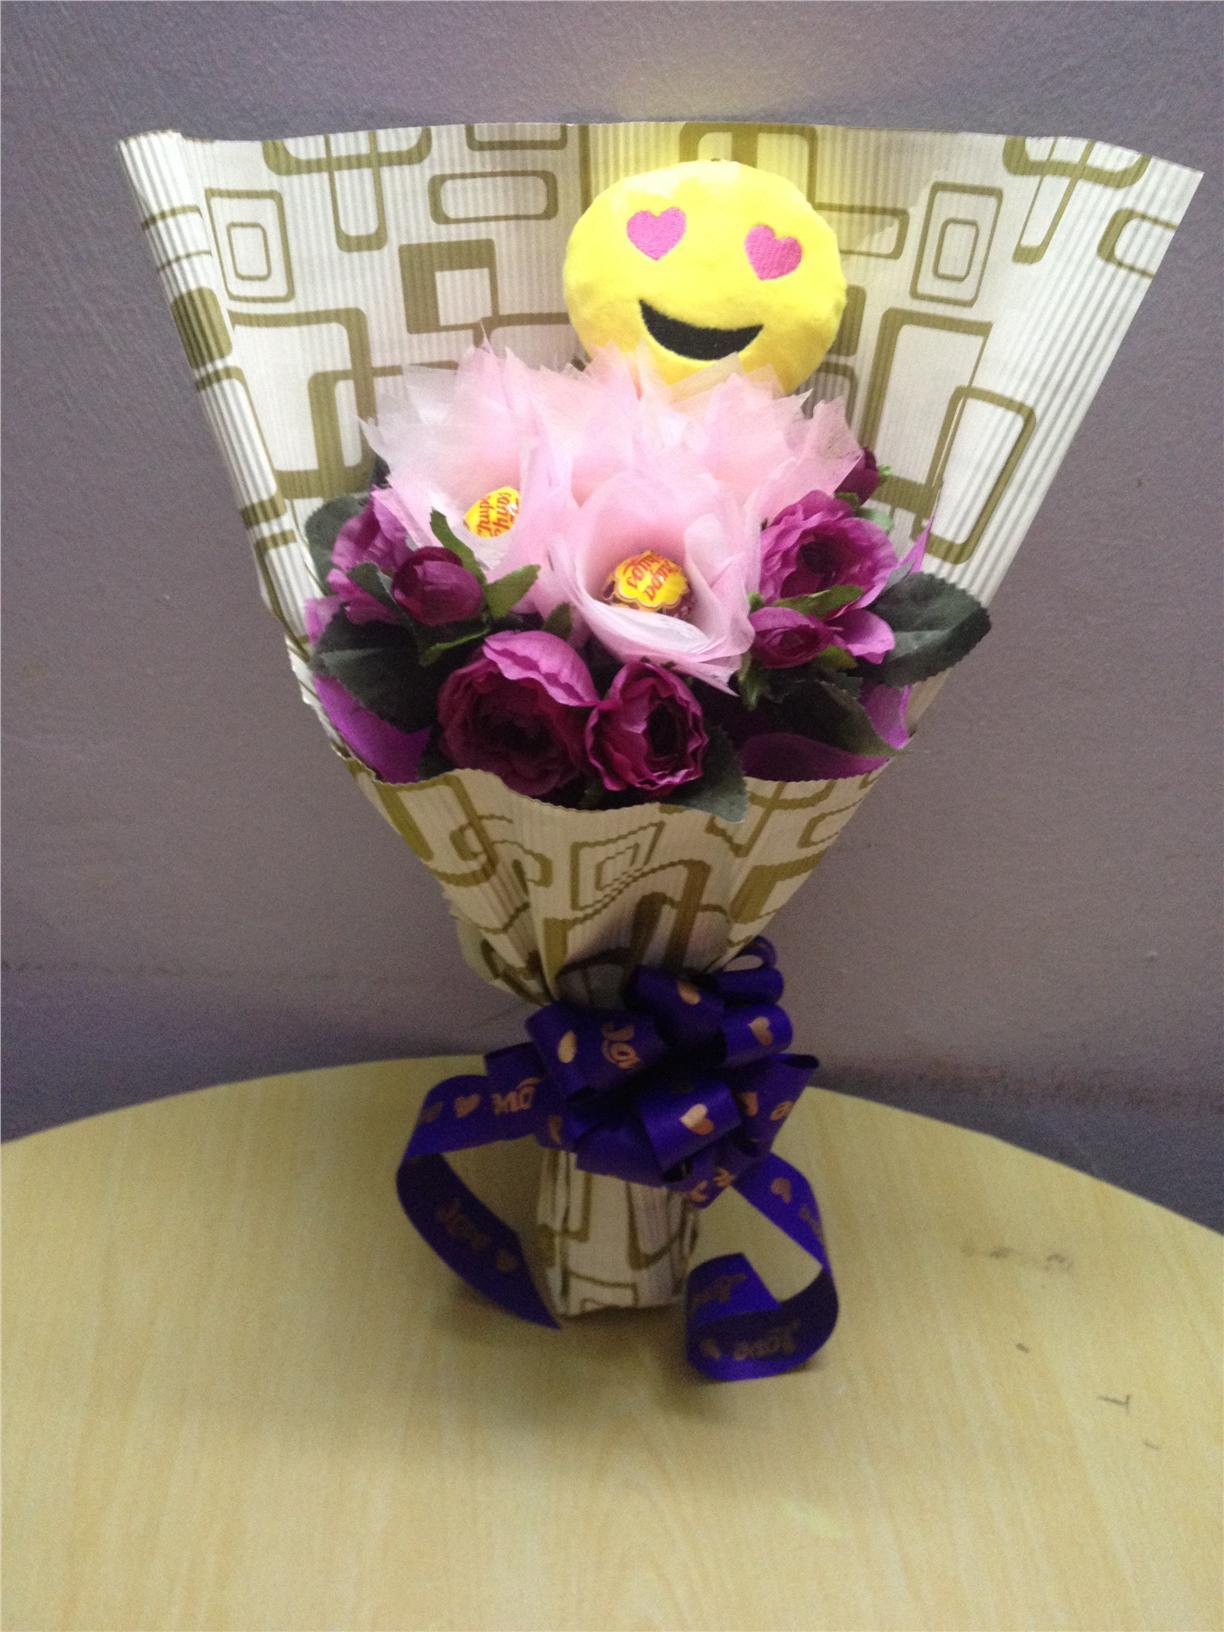 Lollipop flower bouquet end 382016 215 pm lollipop flower bouquet izmirmasajfo